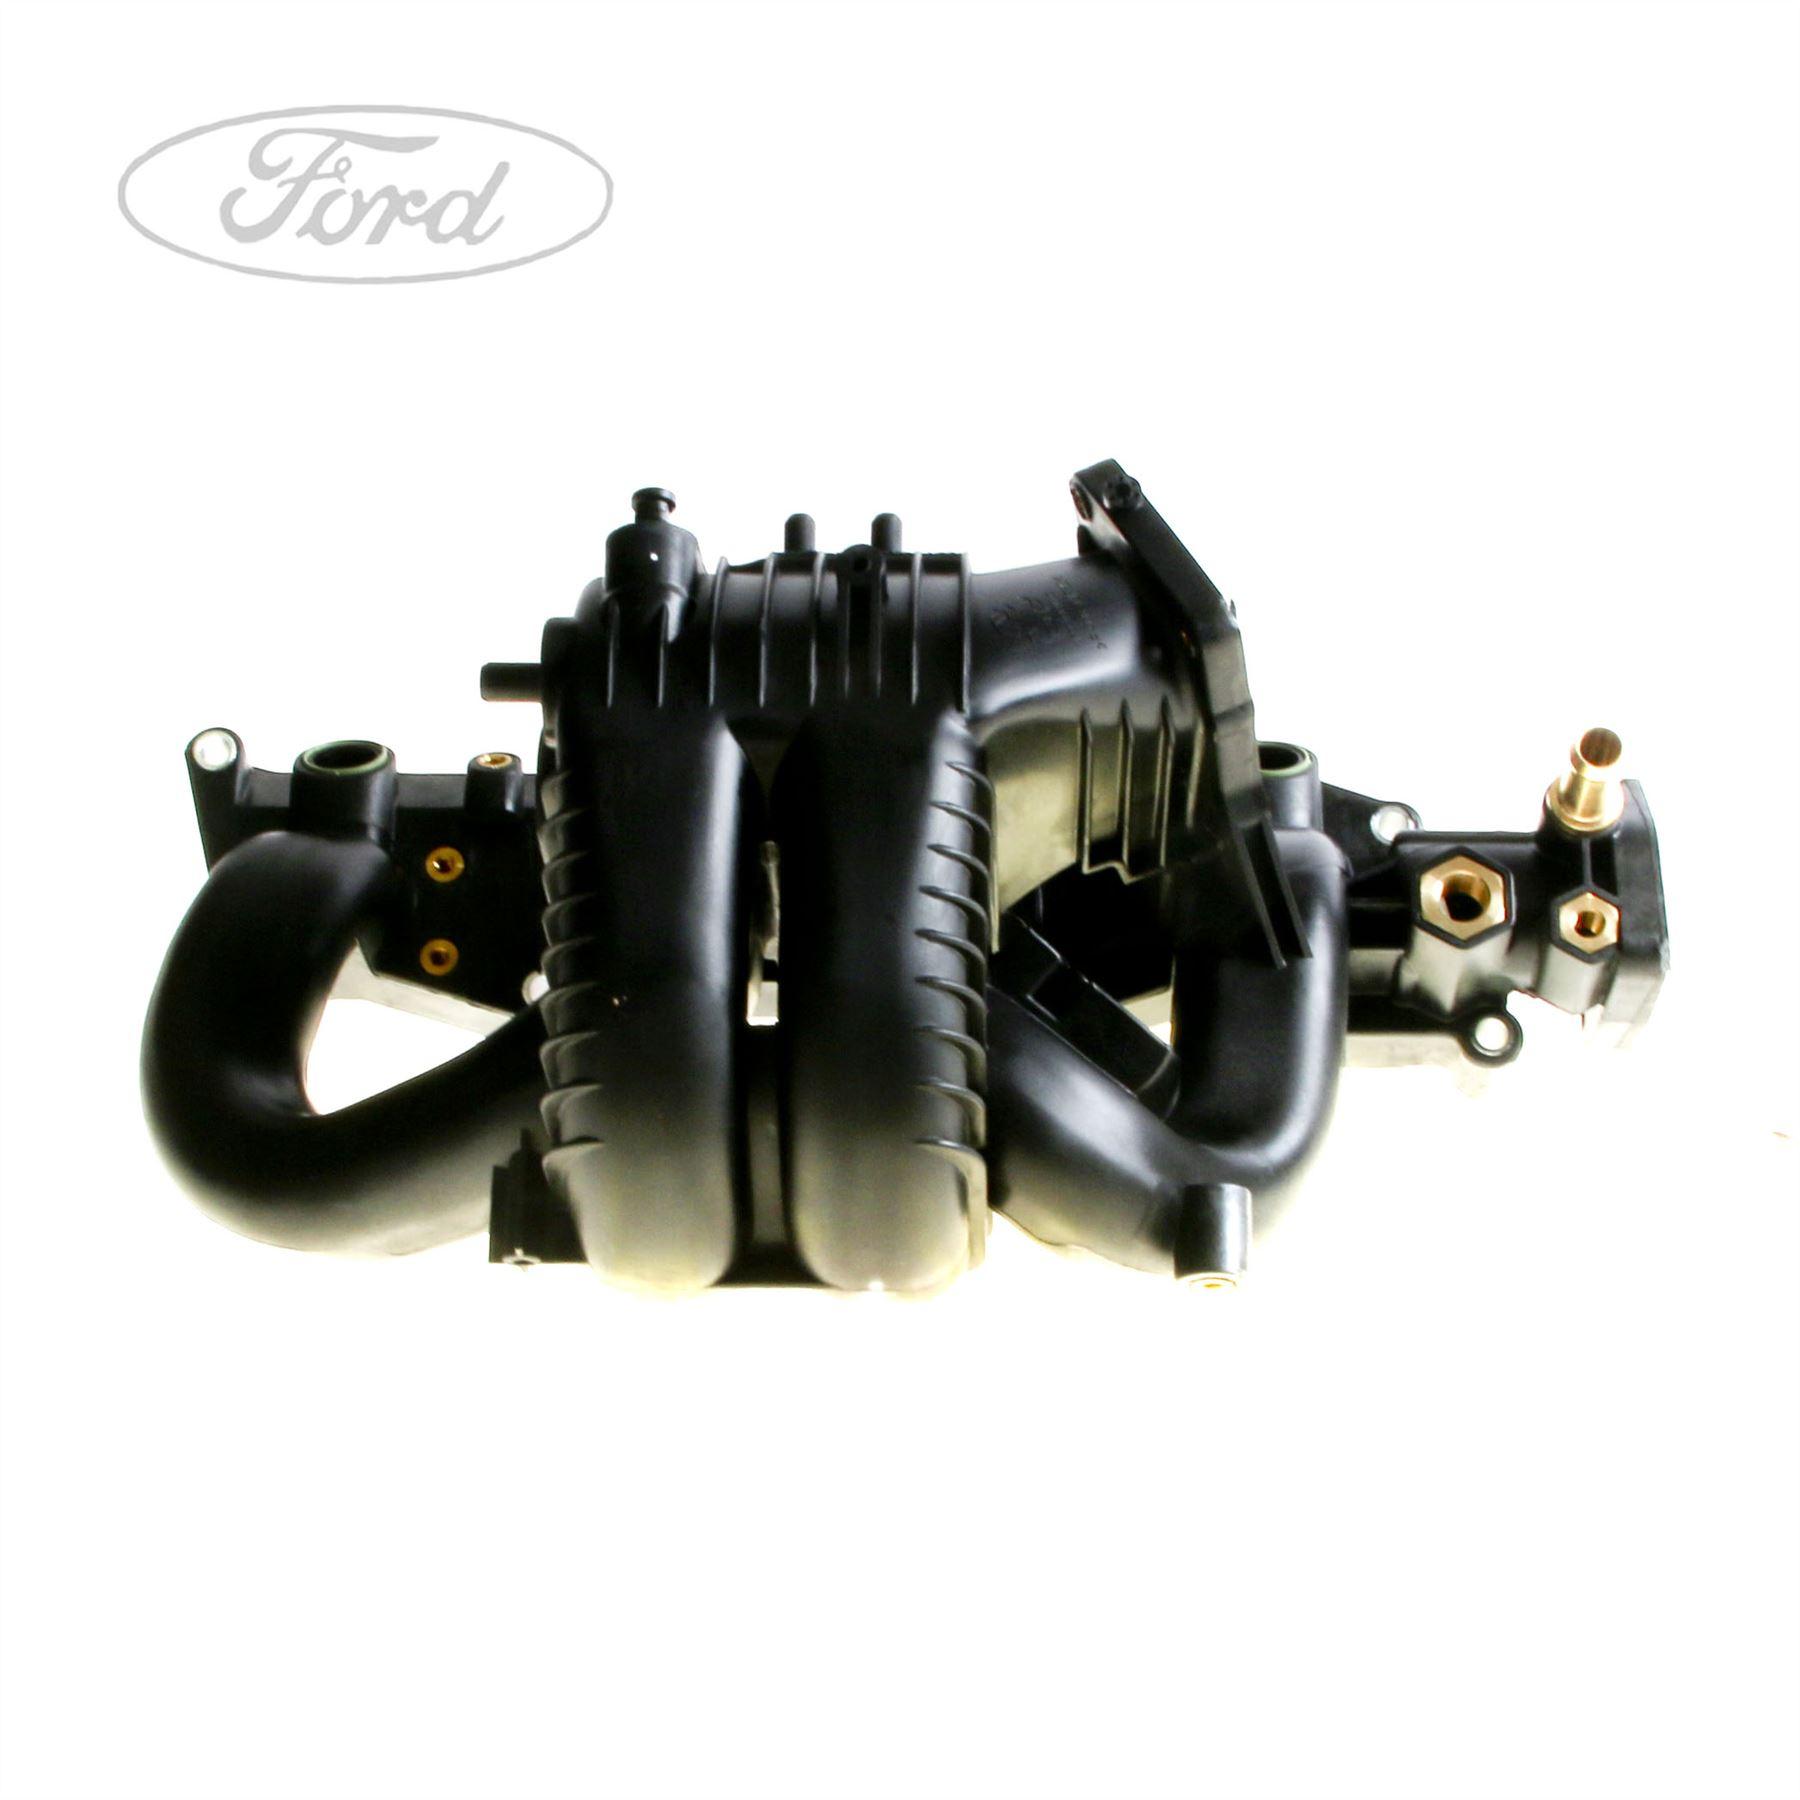 hight resolution of genuine ford scorpio transit mk6 2 3 fuel inlet manifold 145 bhp 1024327